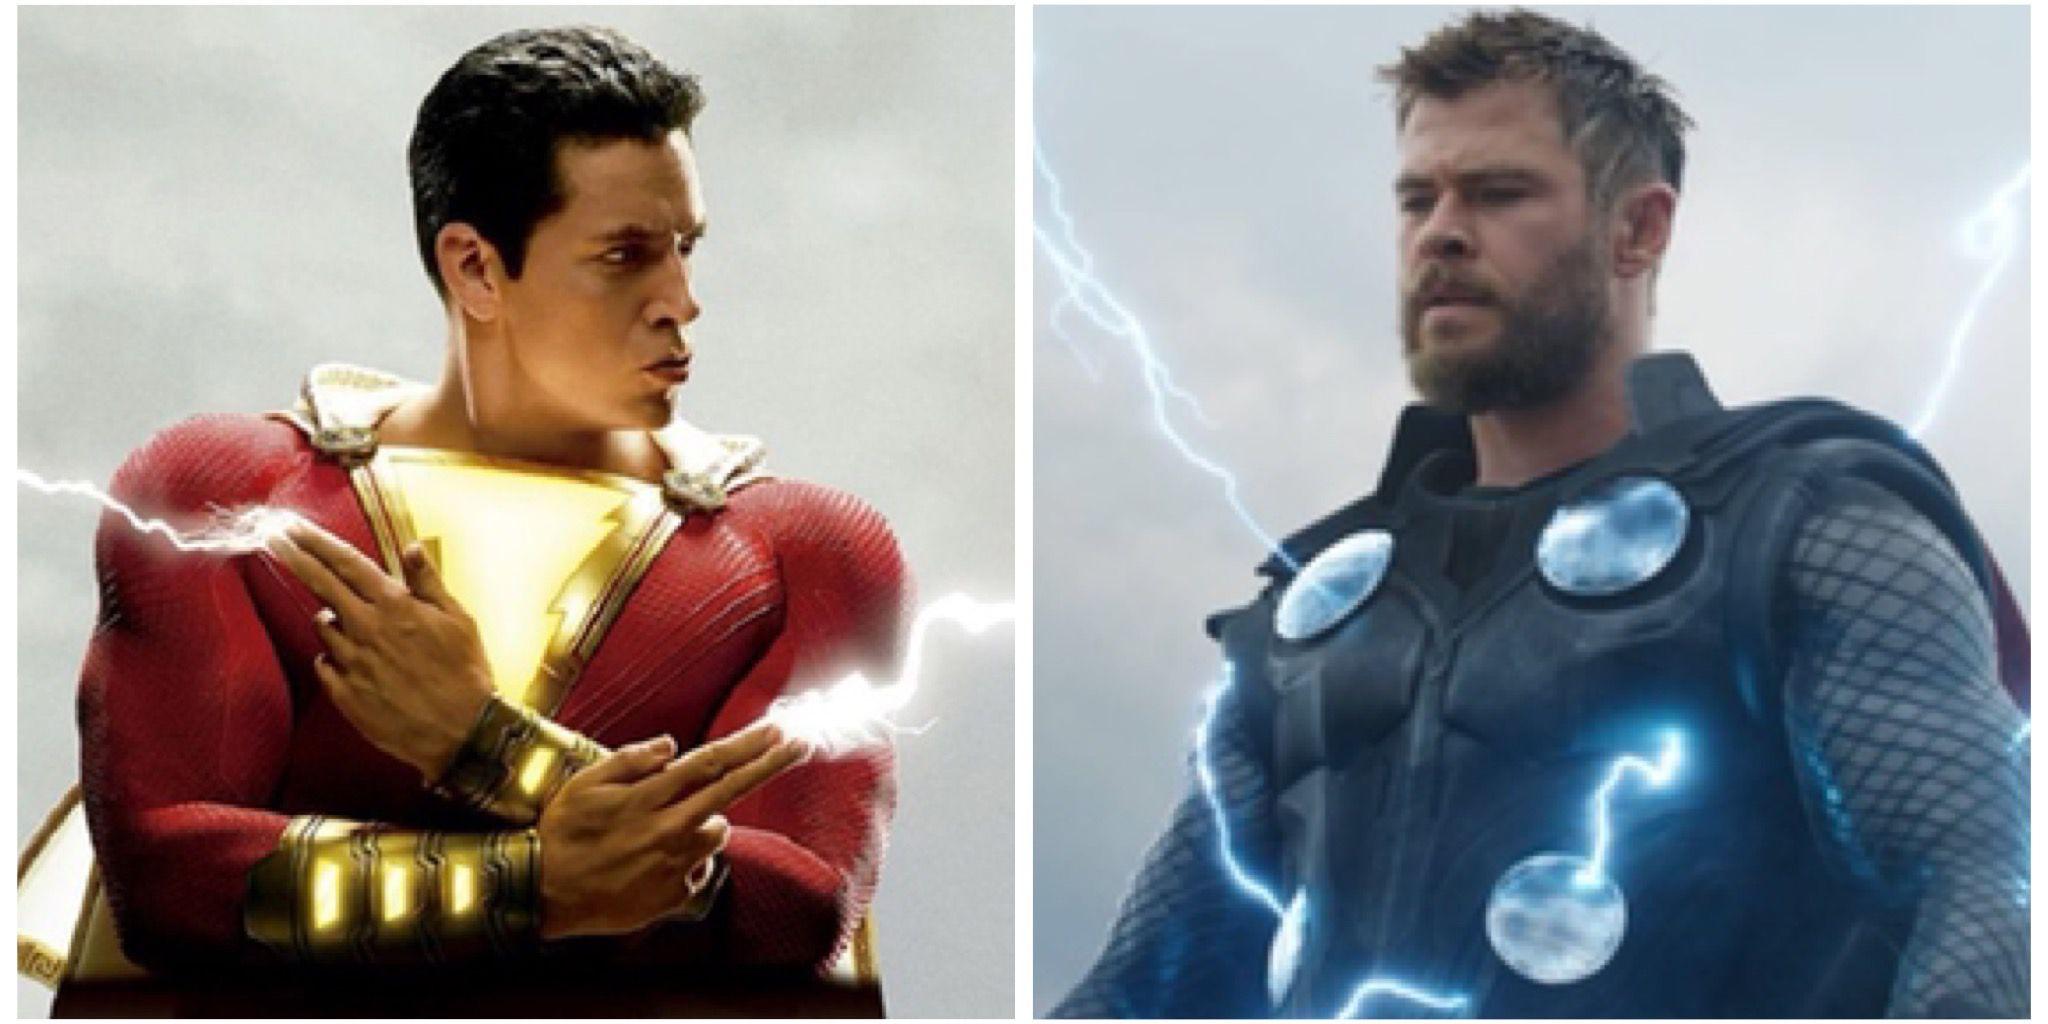 Shazam, Thor, Spider-Man